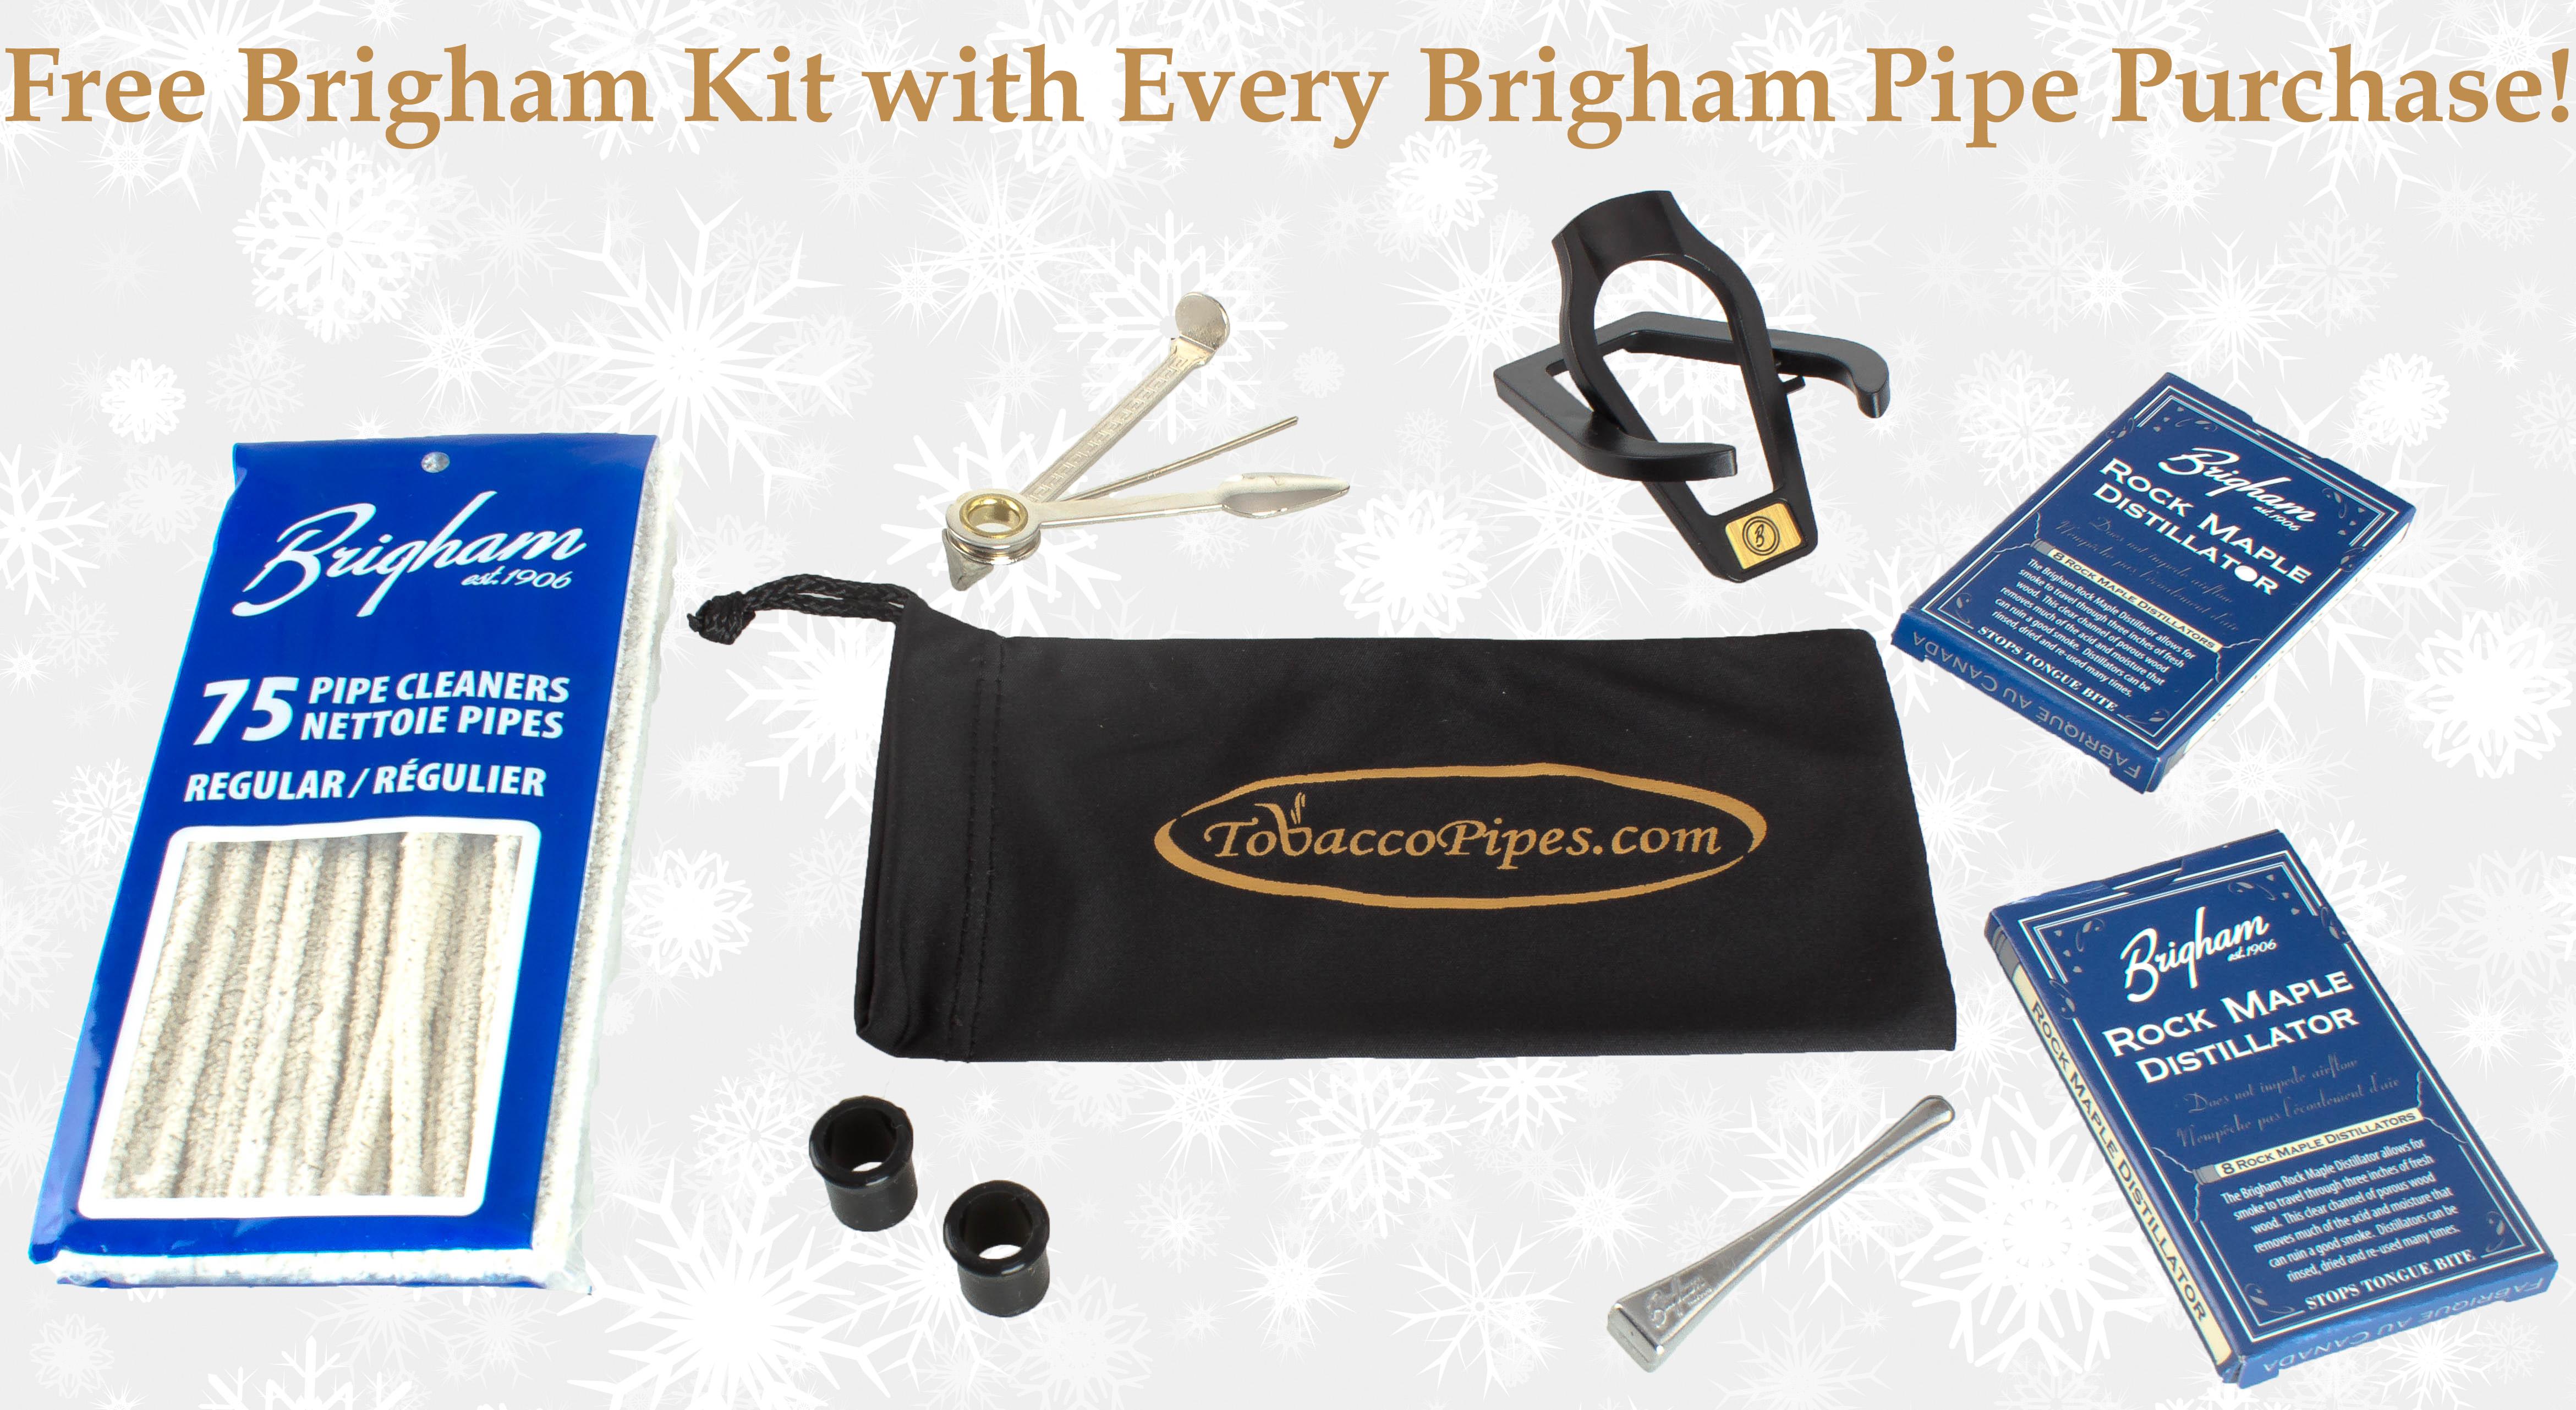 Free Brigham Kit